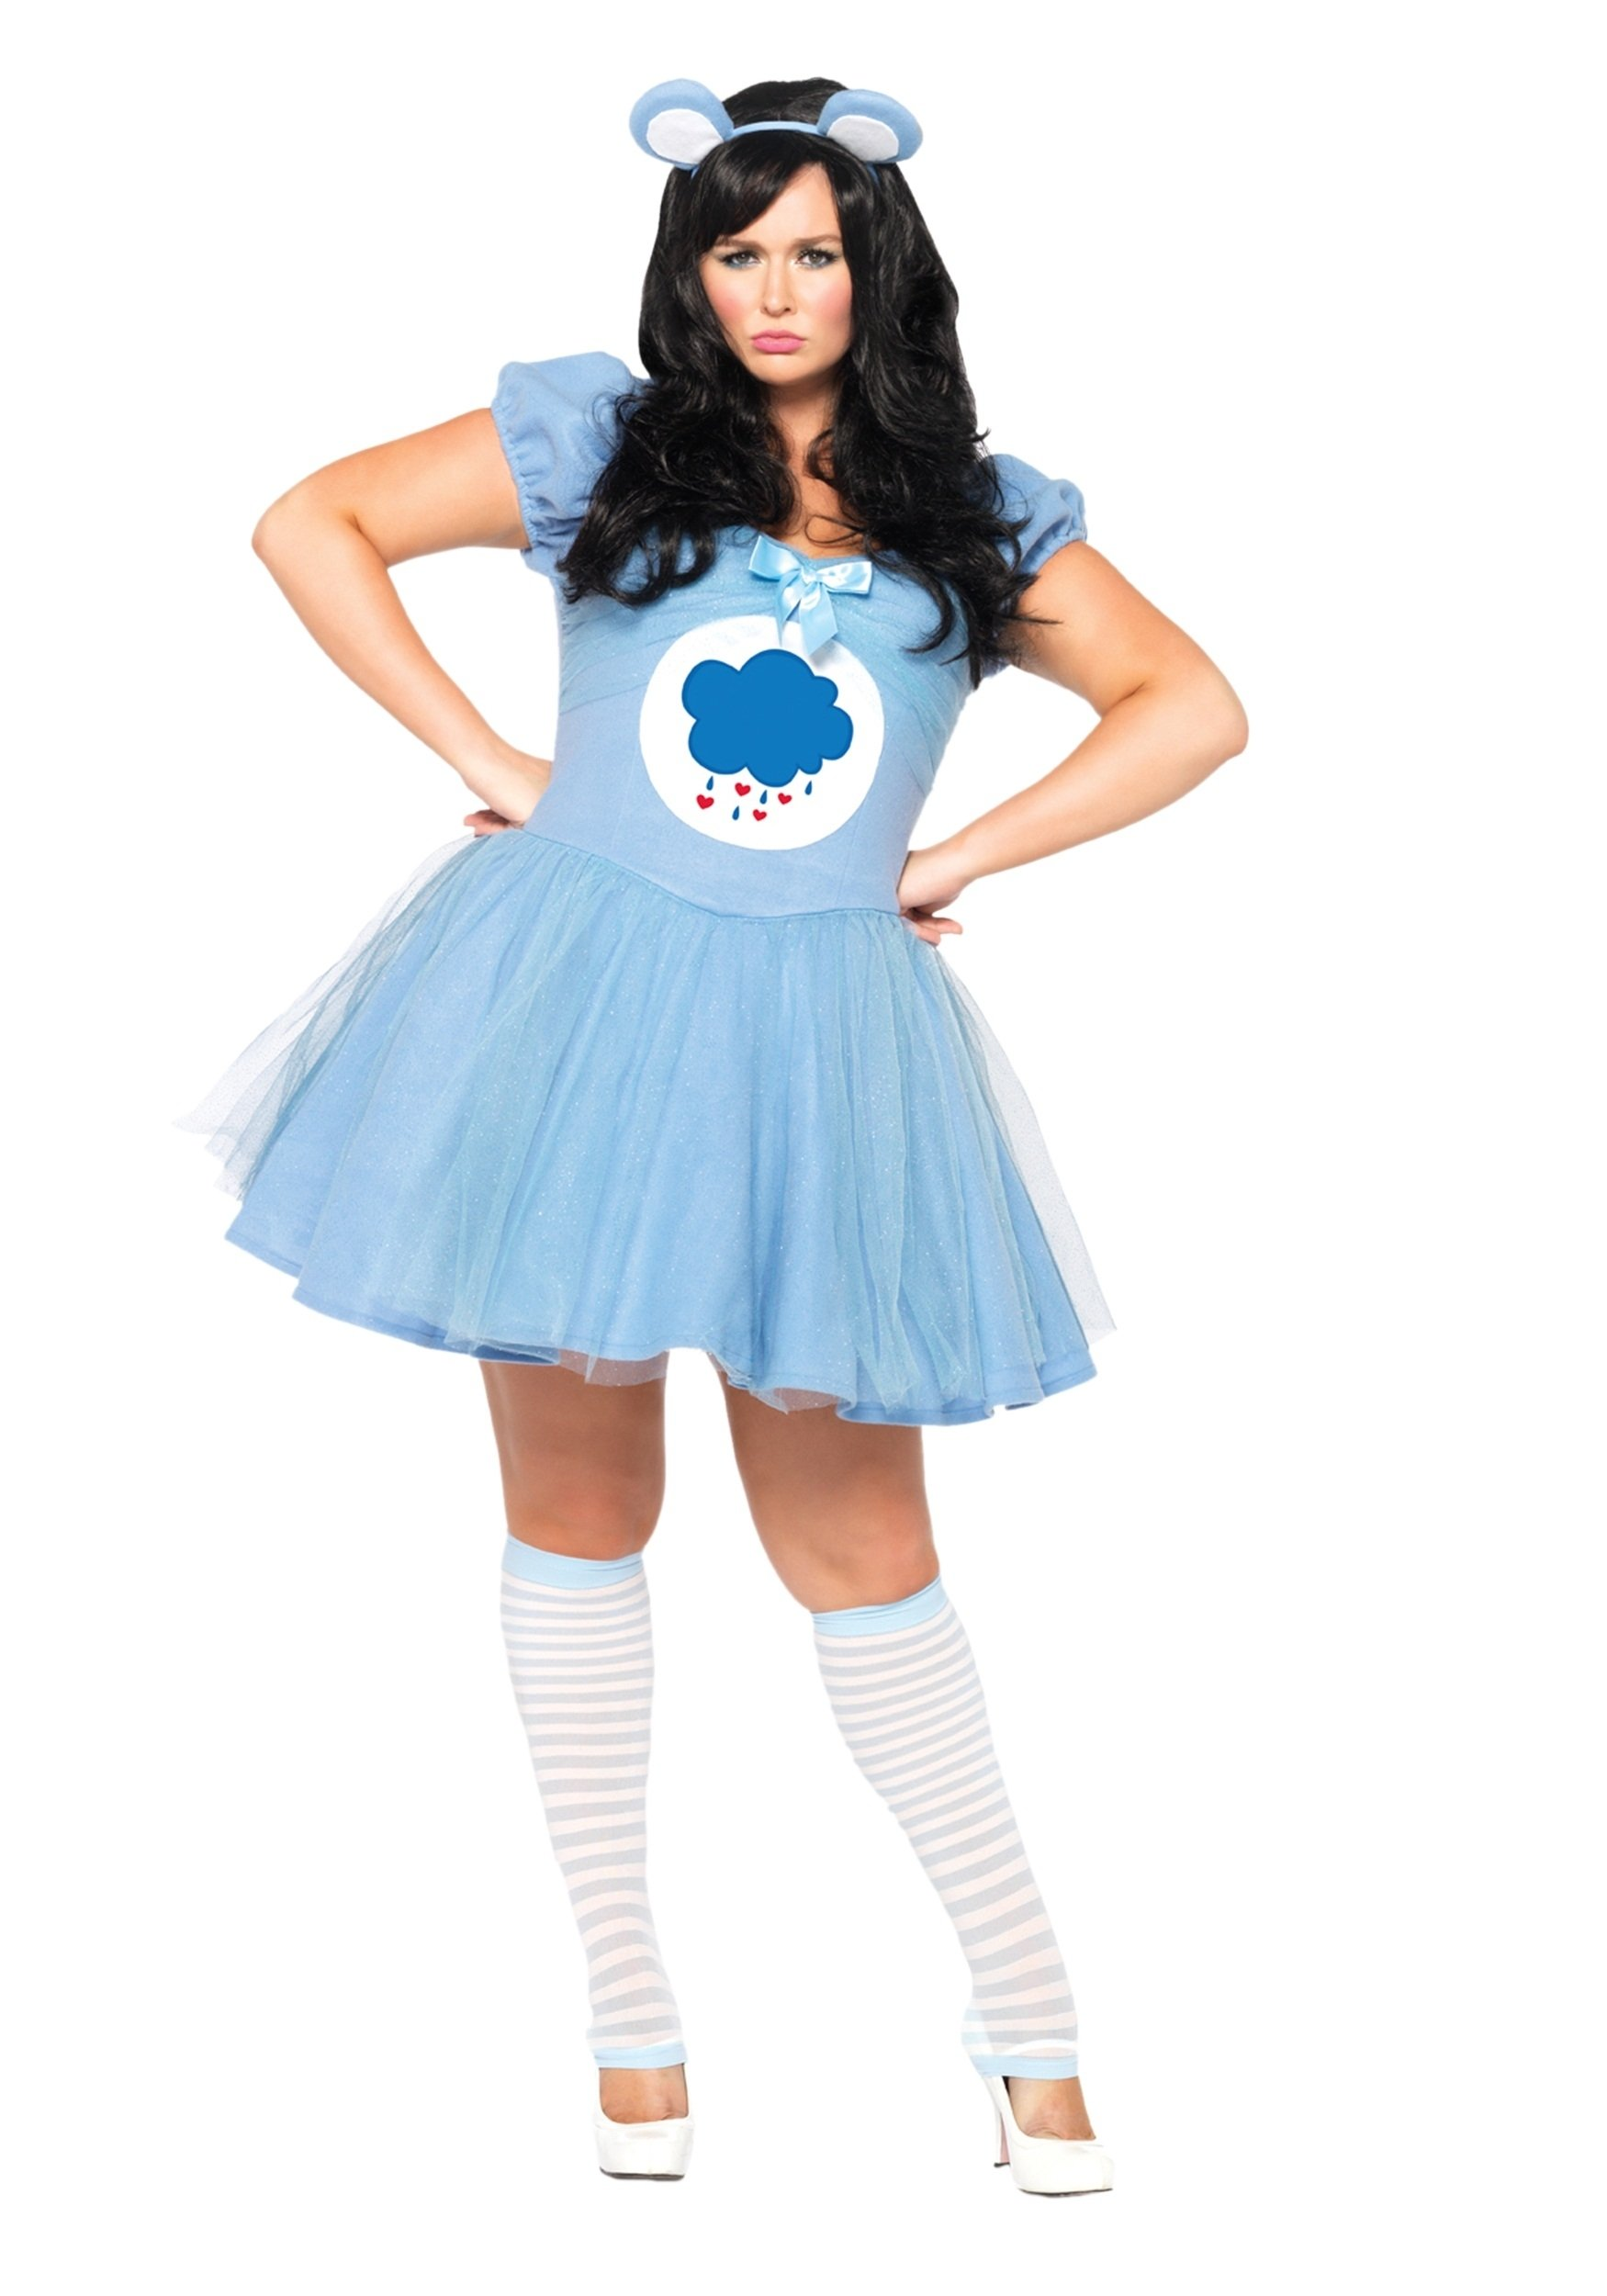 10 pretty plus size costume ideas for women plus size care bears grumpy bear costume halloween